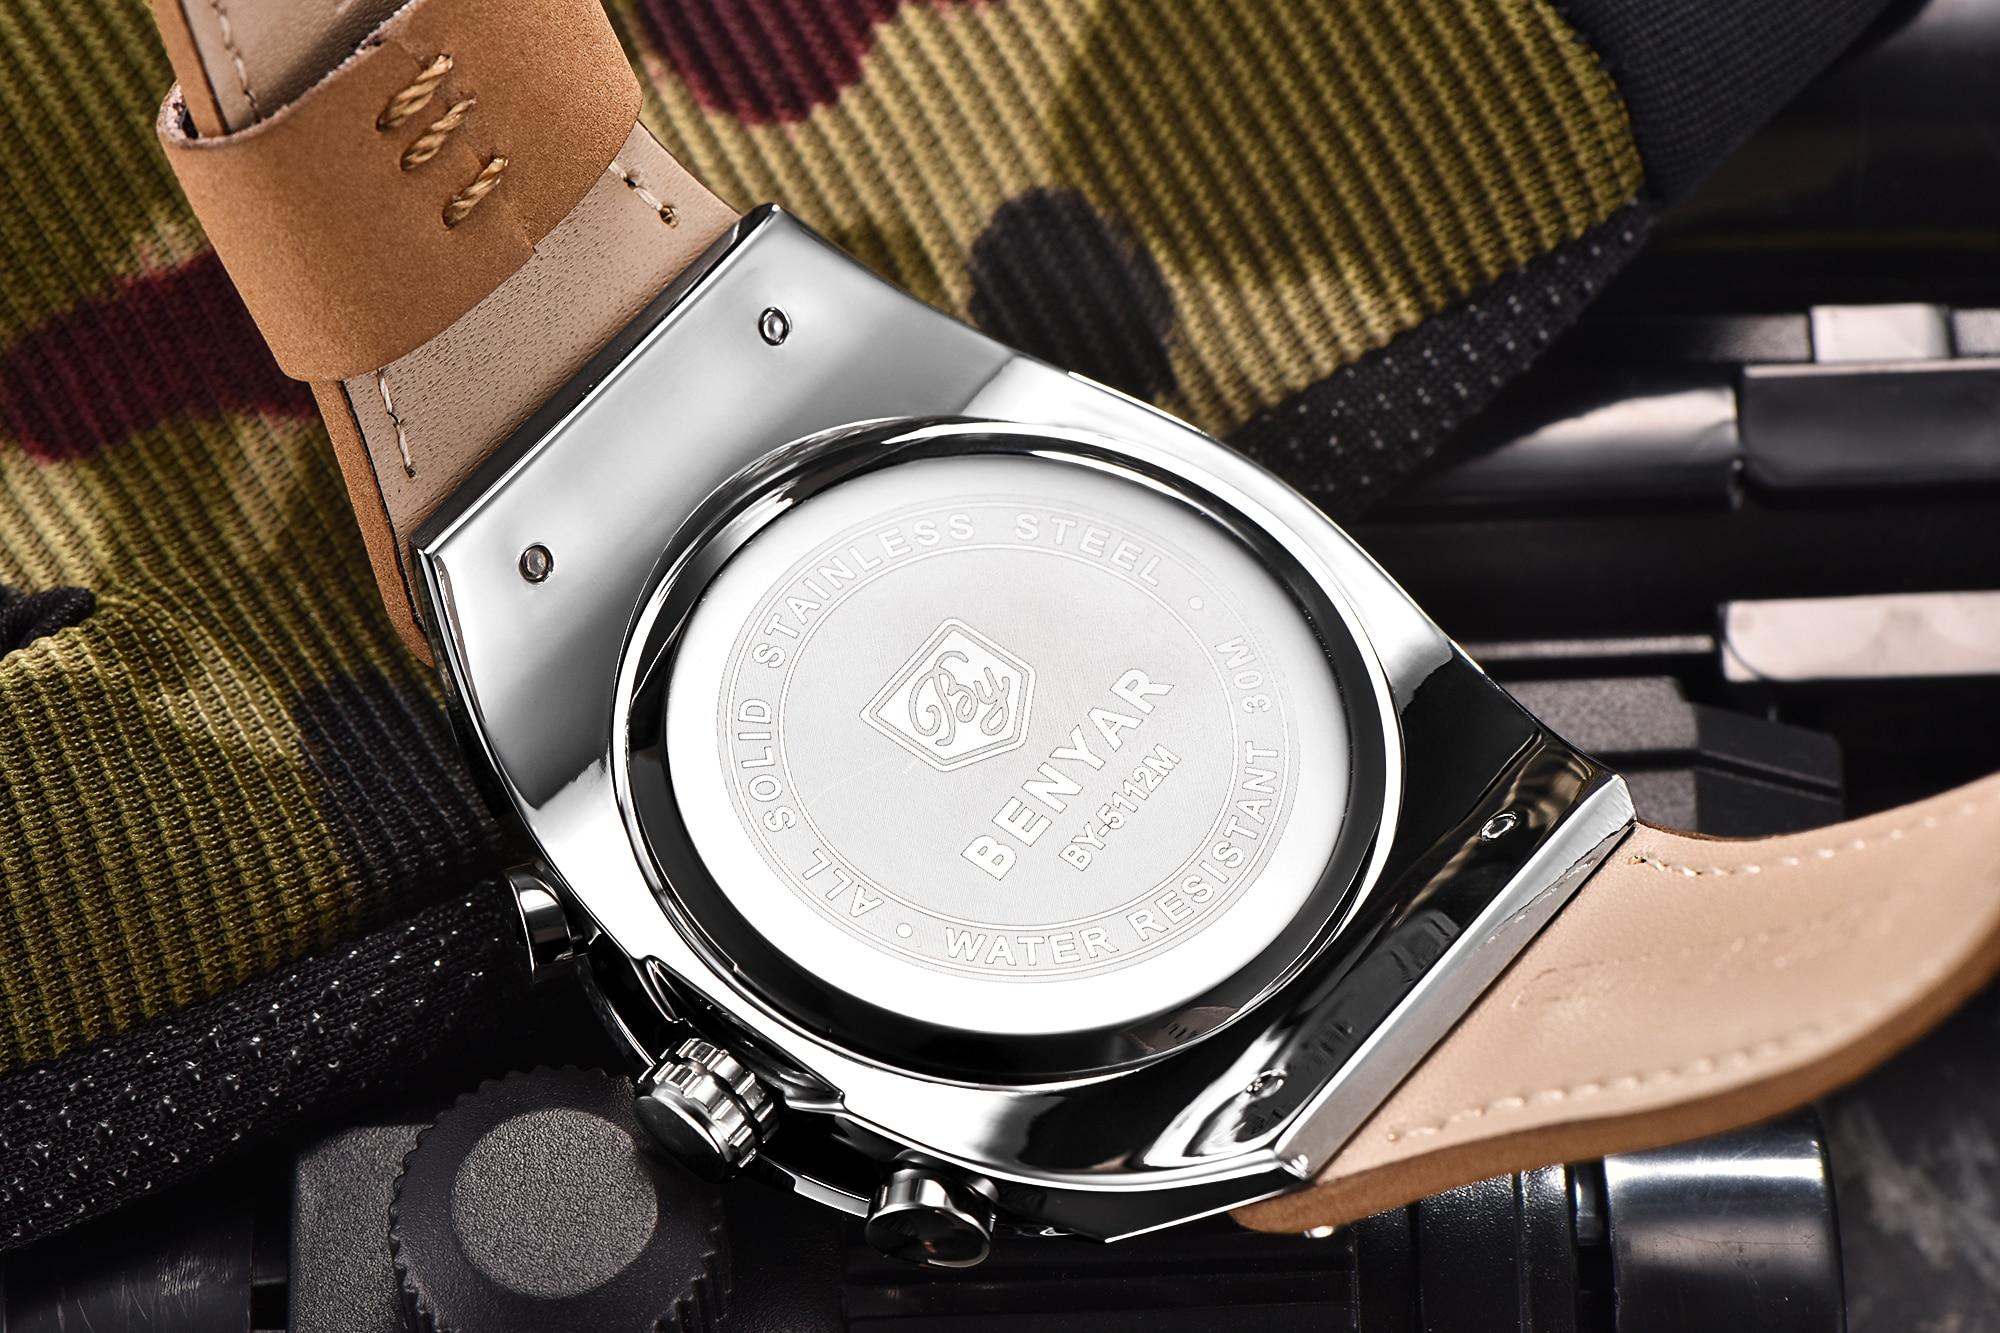 BENYAR Big Dial Sport Watch Men Waterproof Outdoor Military Chronograph Quartz Leather Watch Army Male Clock Relogio Masculino 2